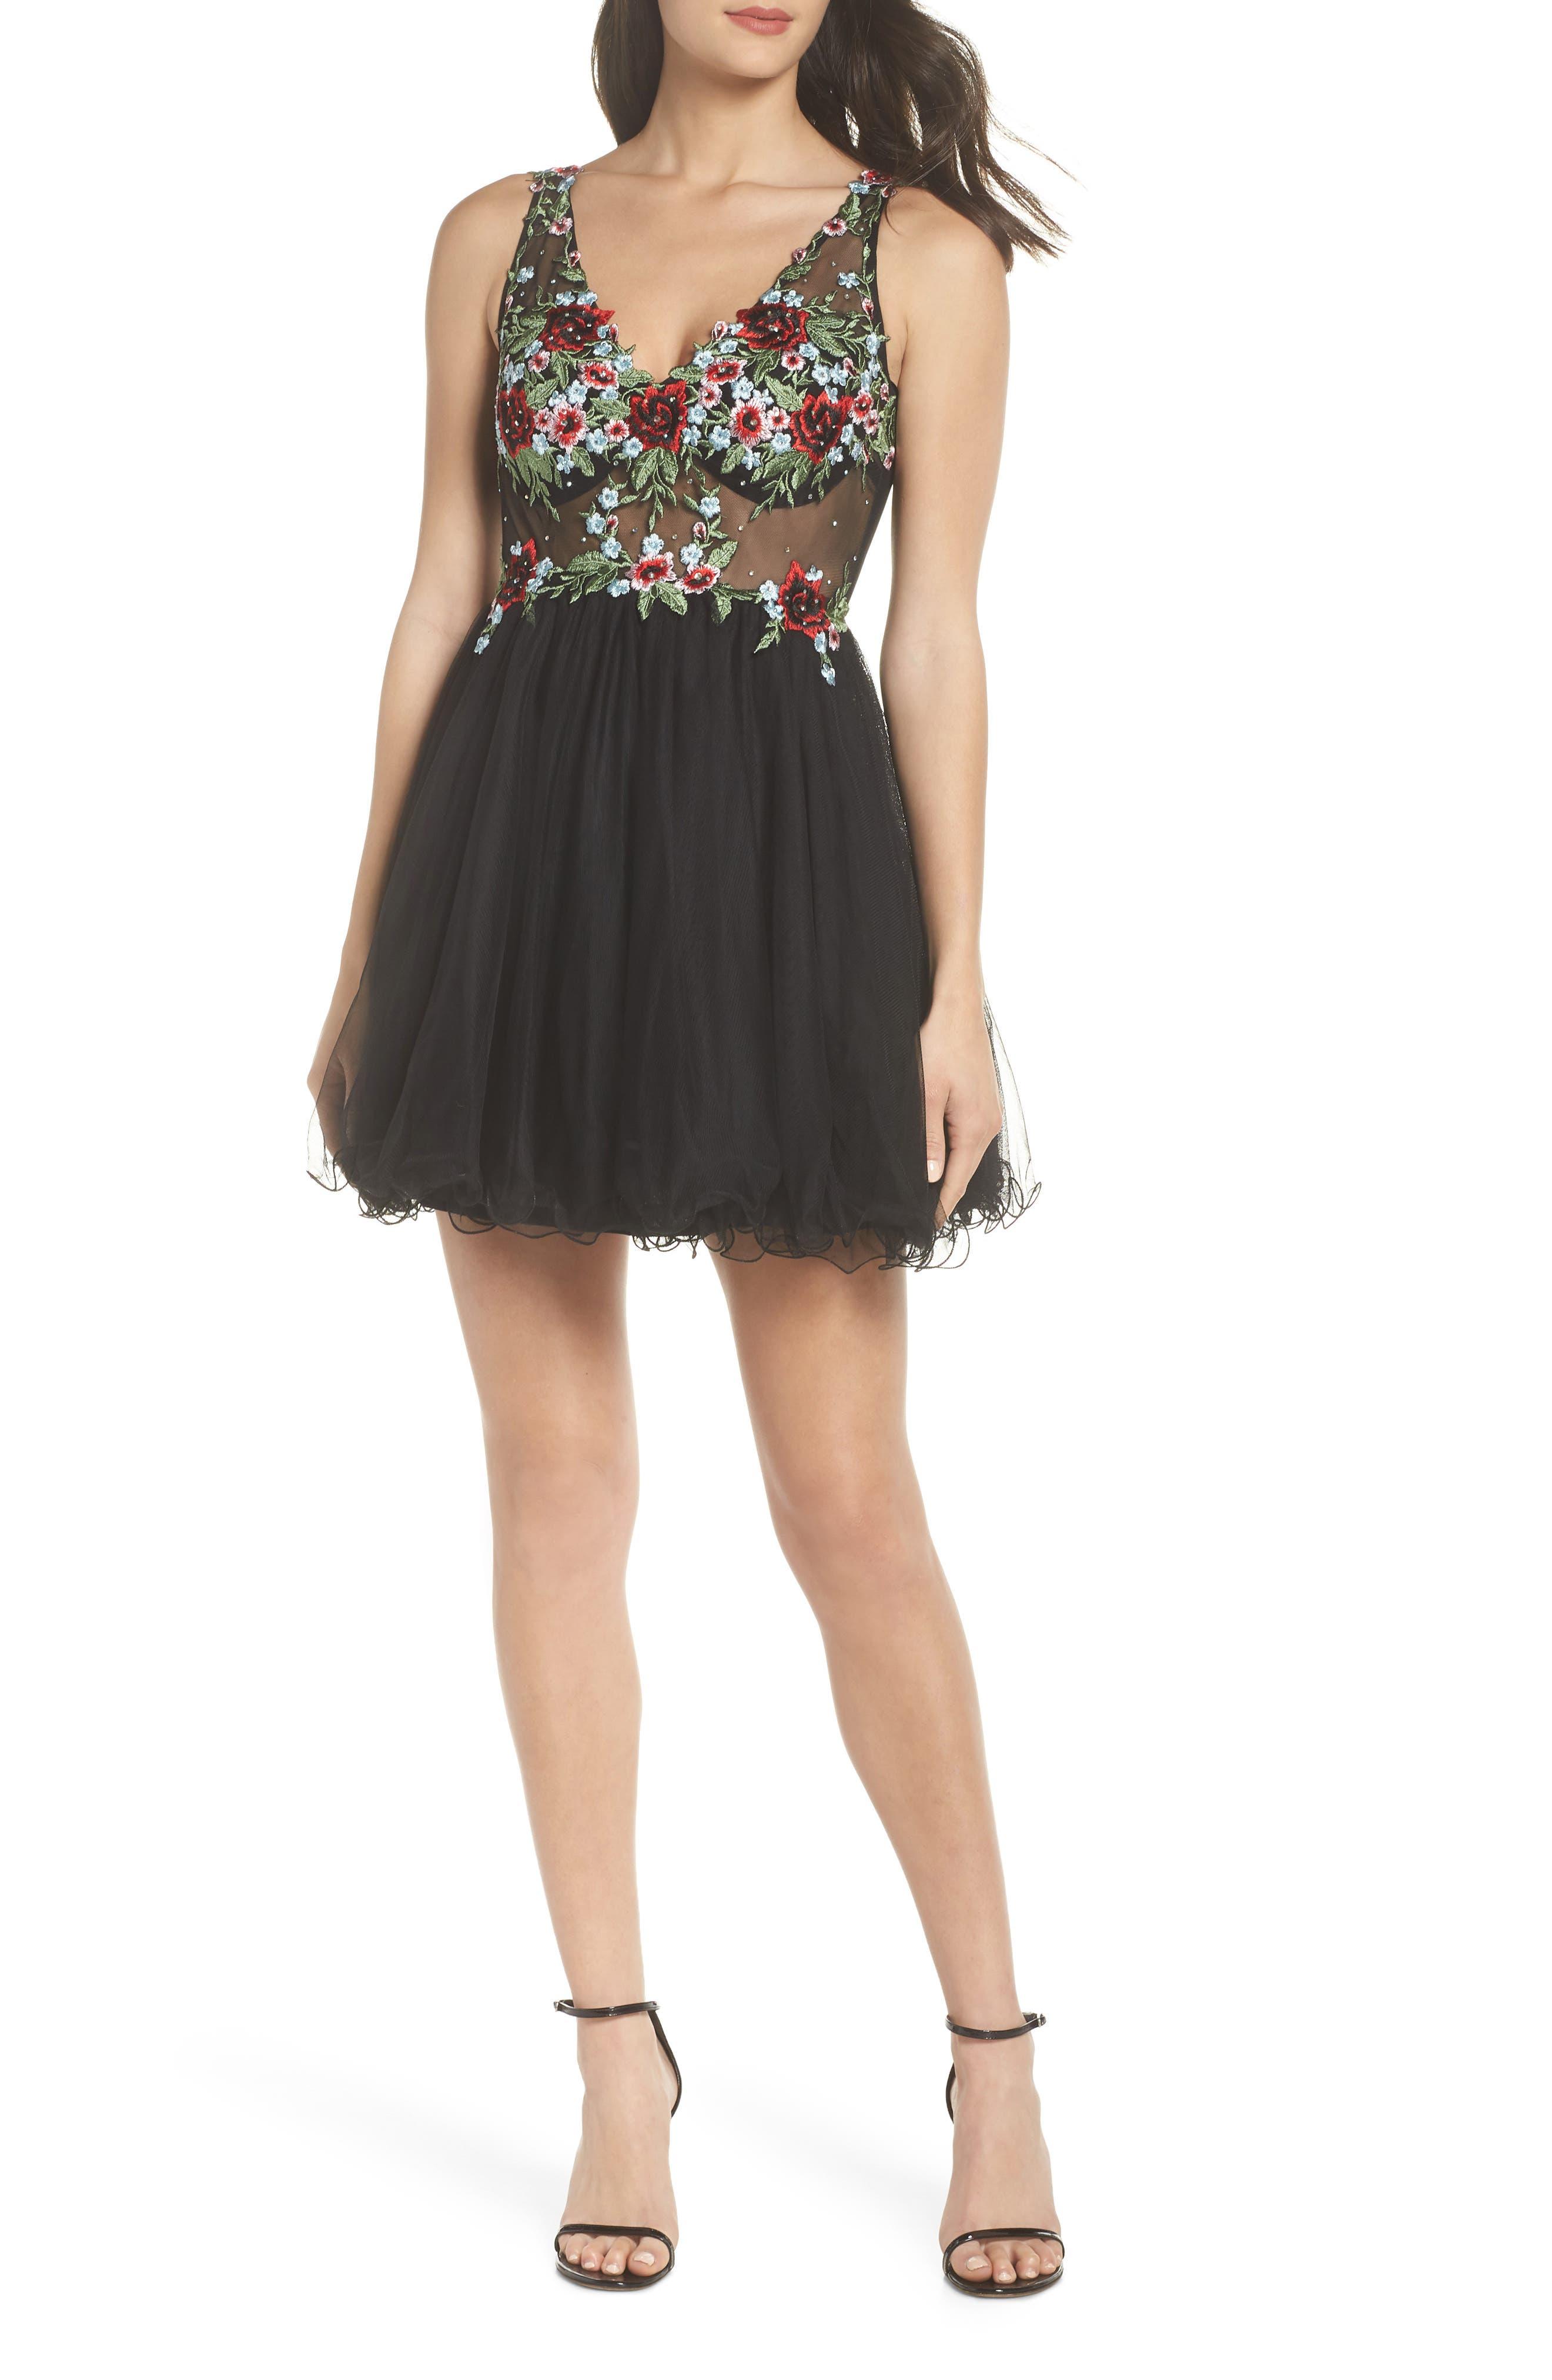 Blondie Nites Embroidered Fit & Flare Dress, Black